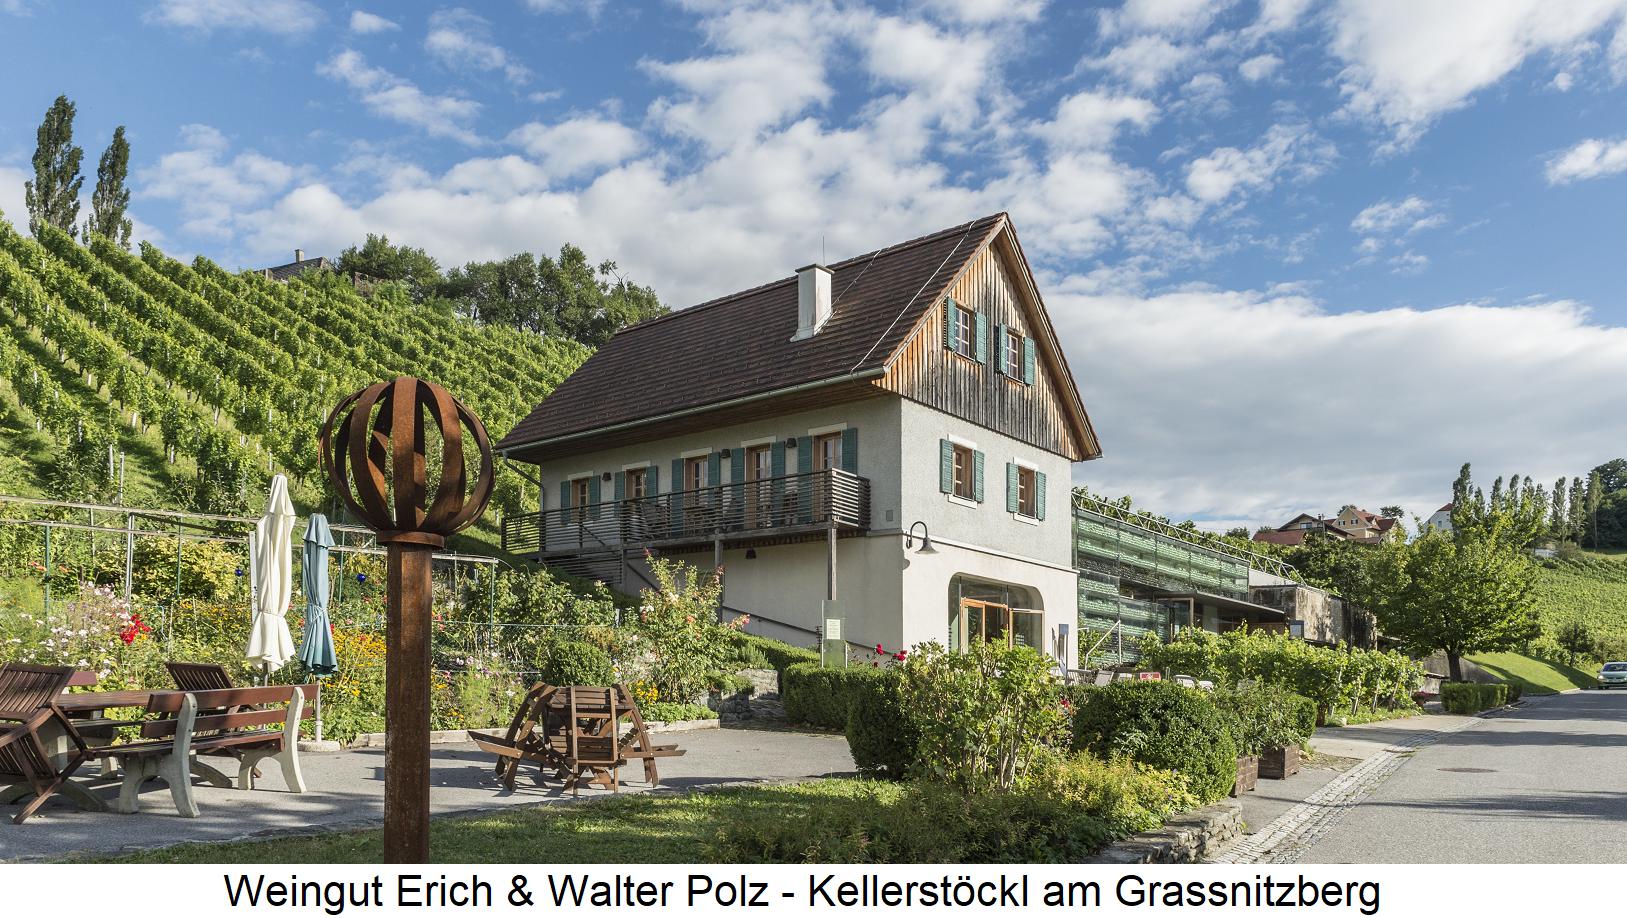 Polz Erich und Walter - Kellerstöckl am Grassnitzberg